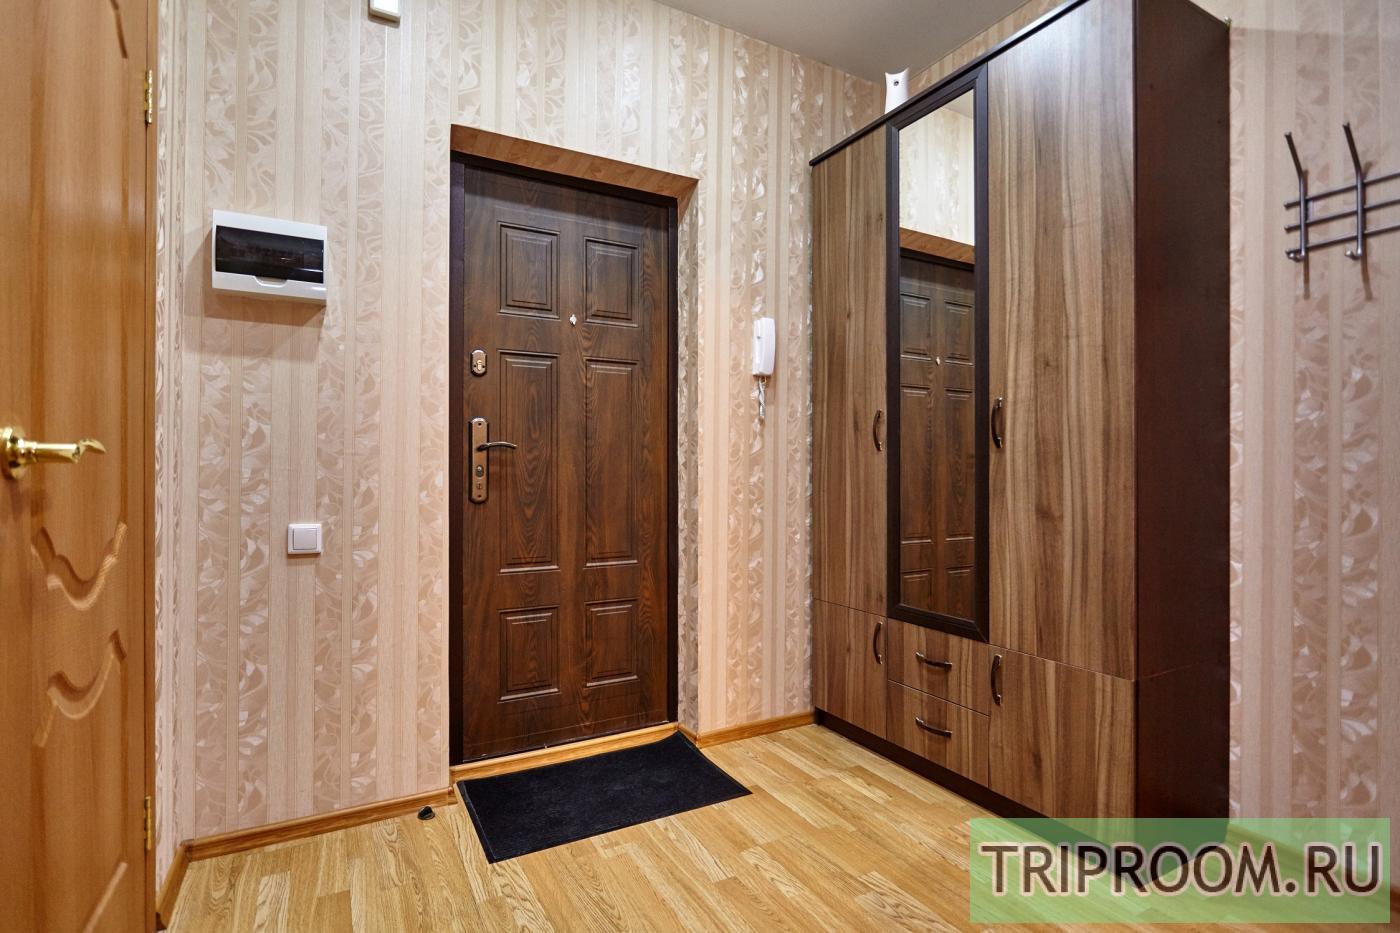 1-комнатная квартира посуточно (вариант № 6860), ул. Соколова улица, фото № 14